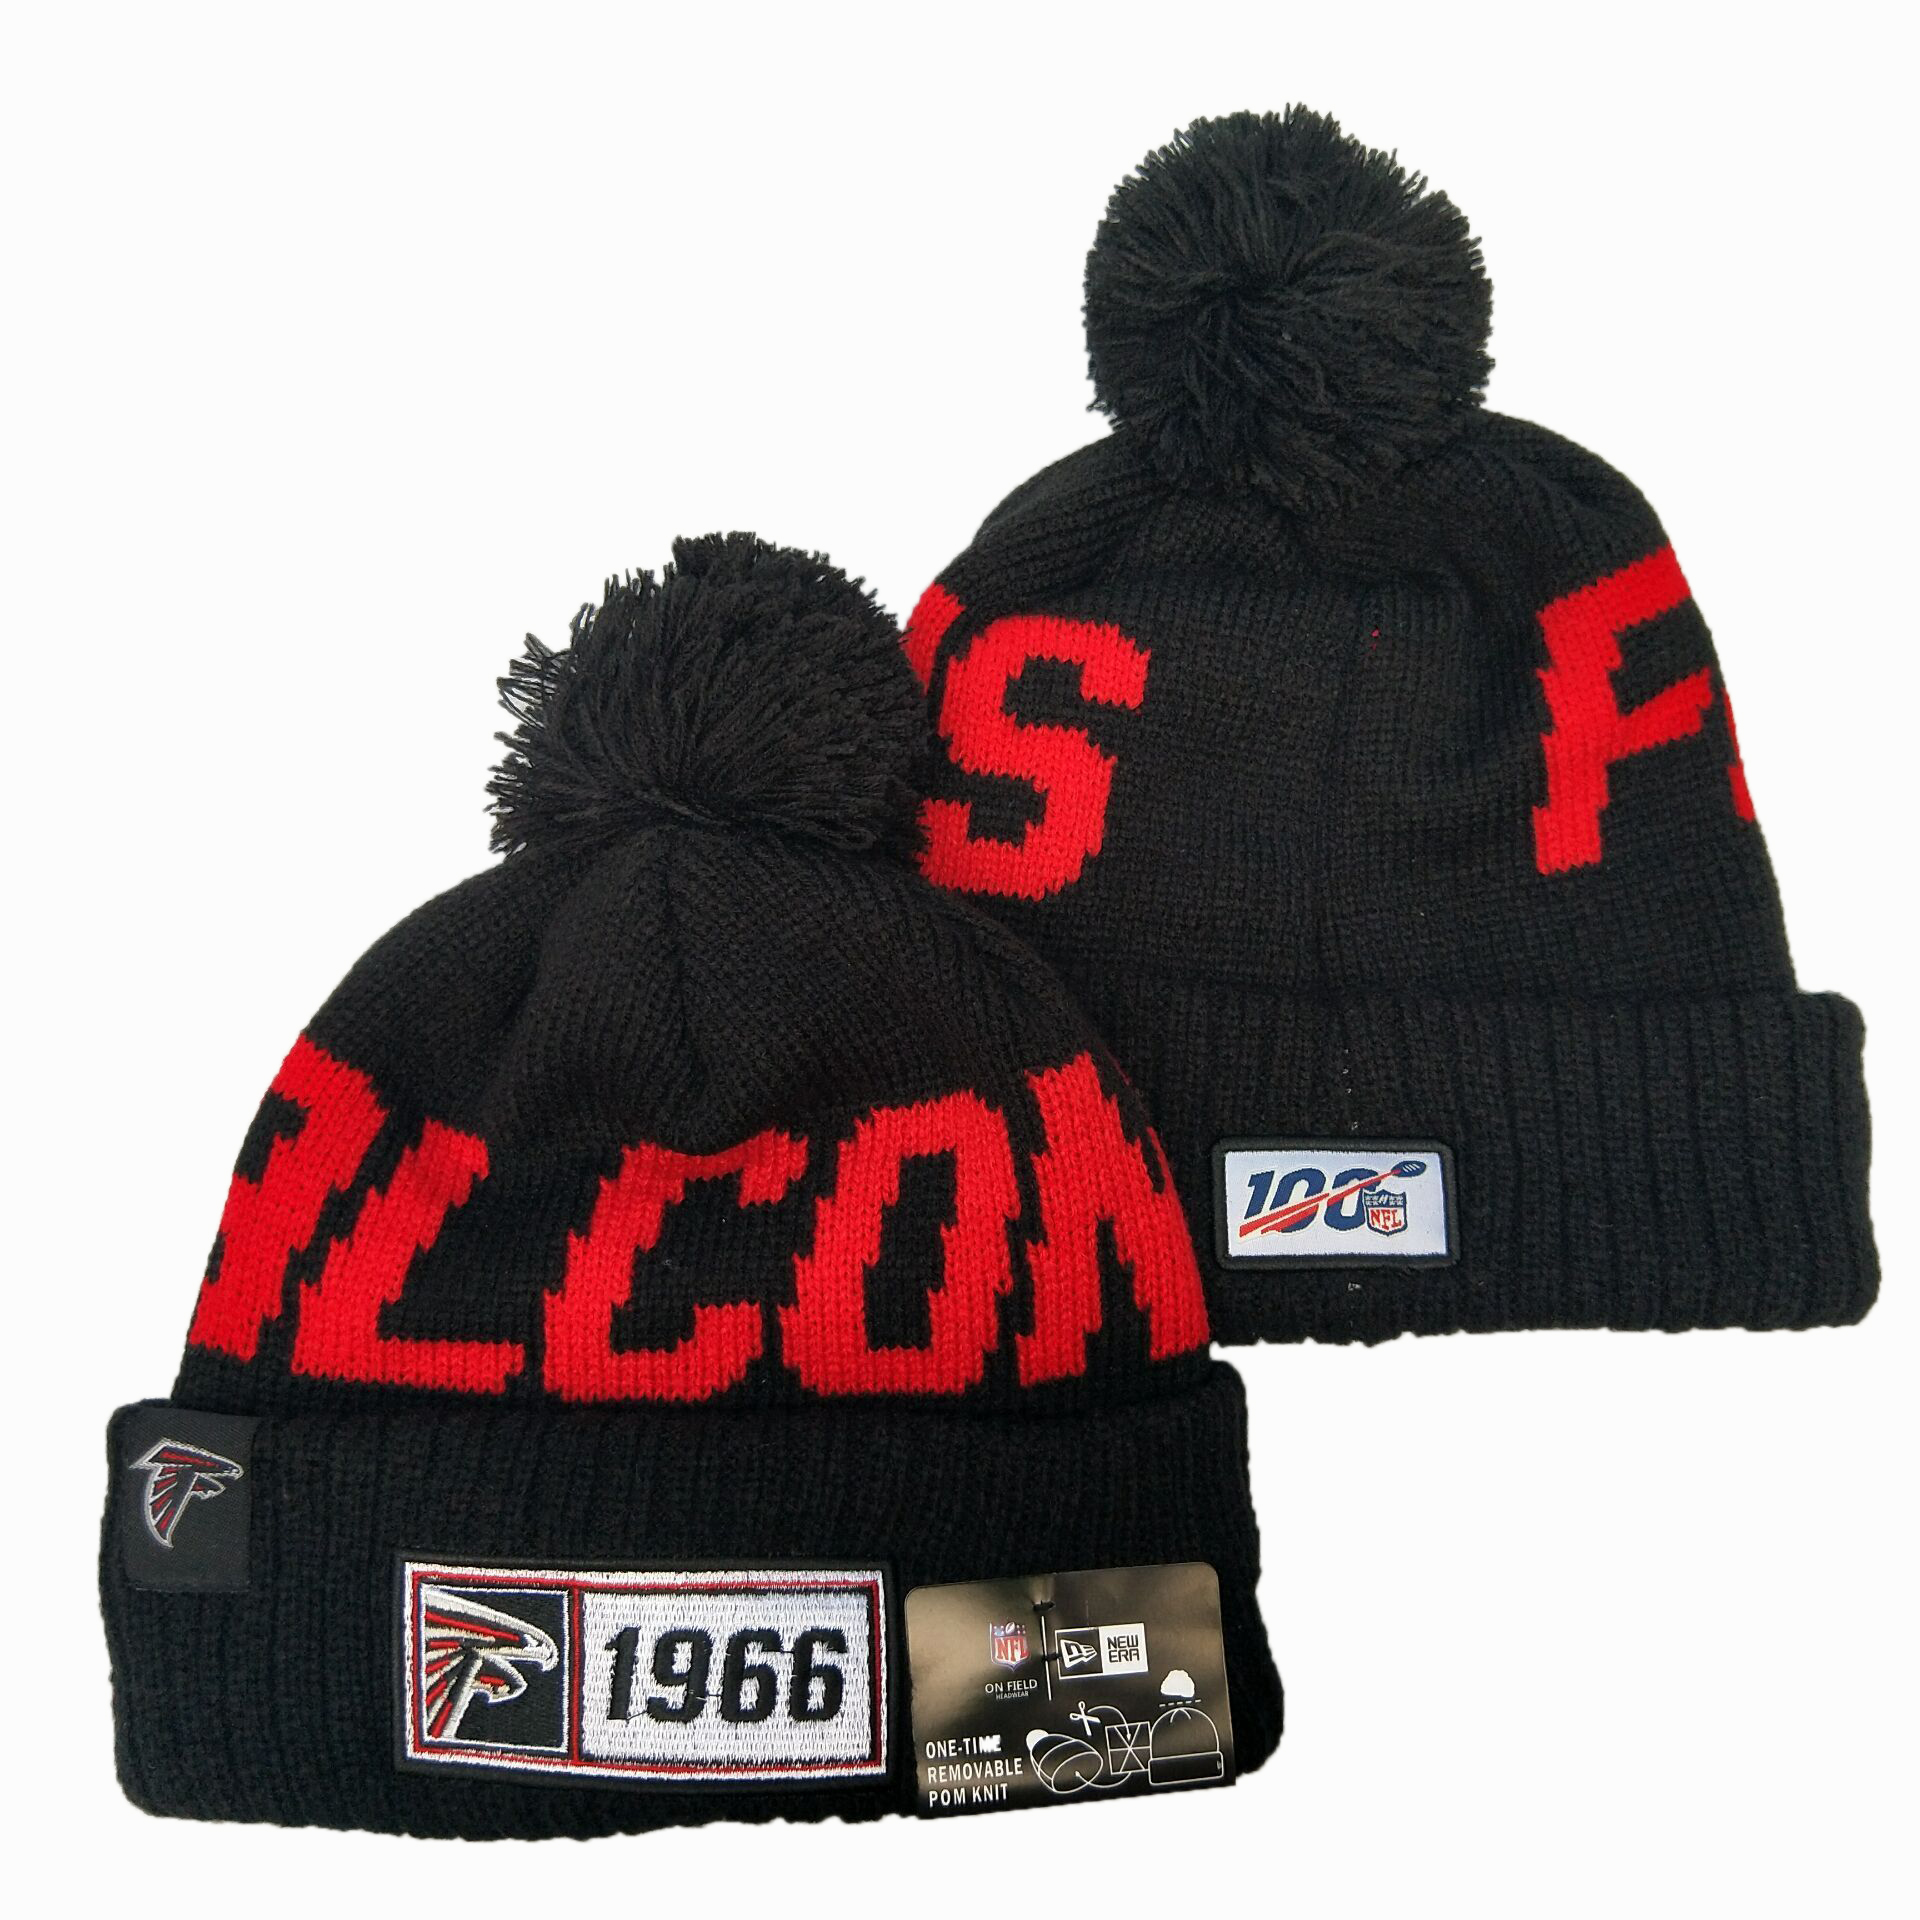 Falcons Team Logo Black 100th Season Pom Knit Hat YD